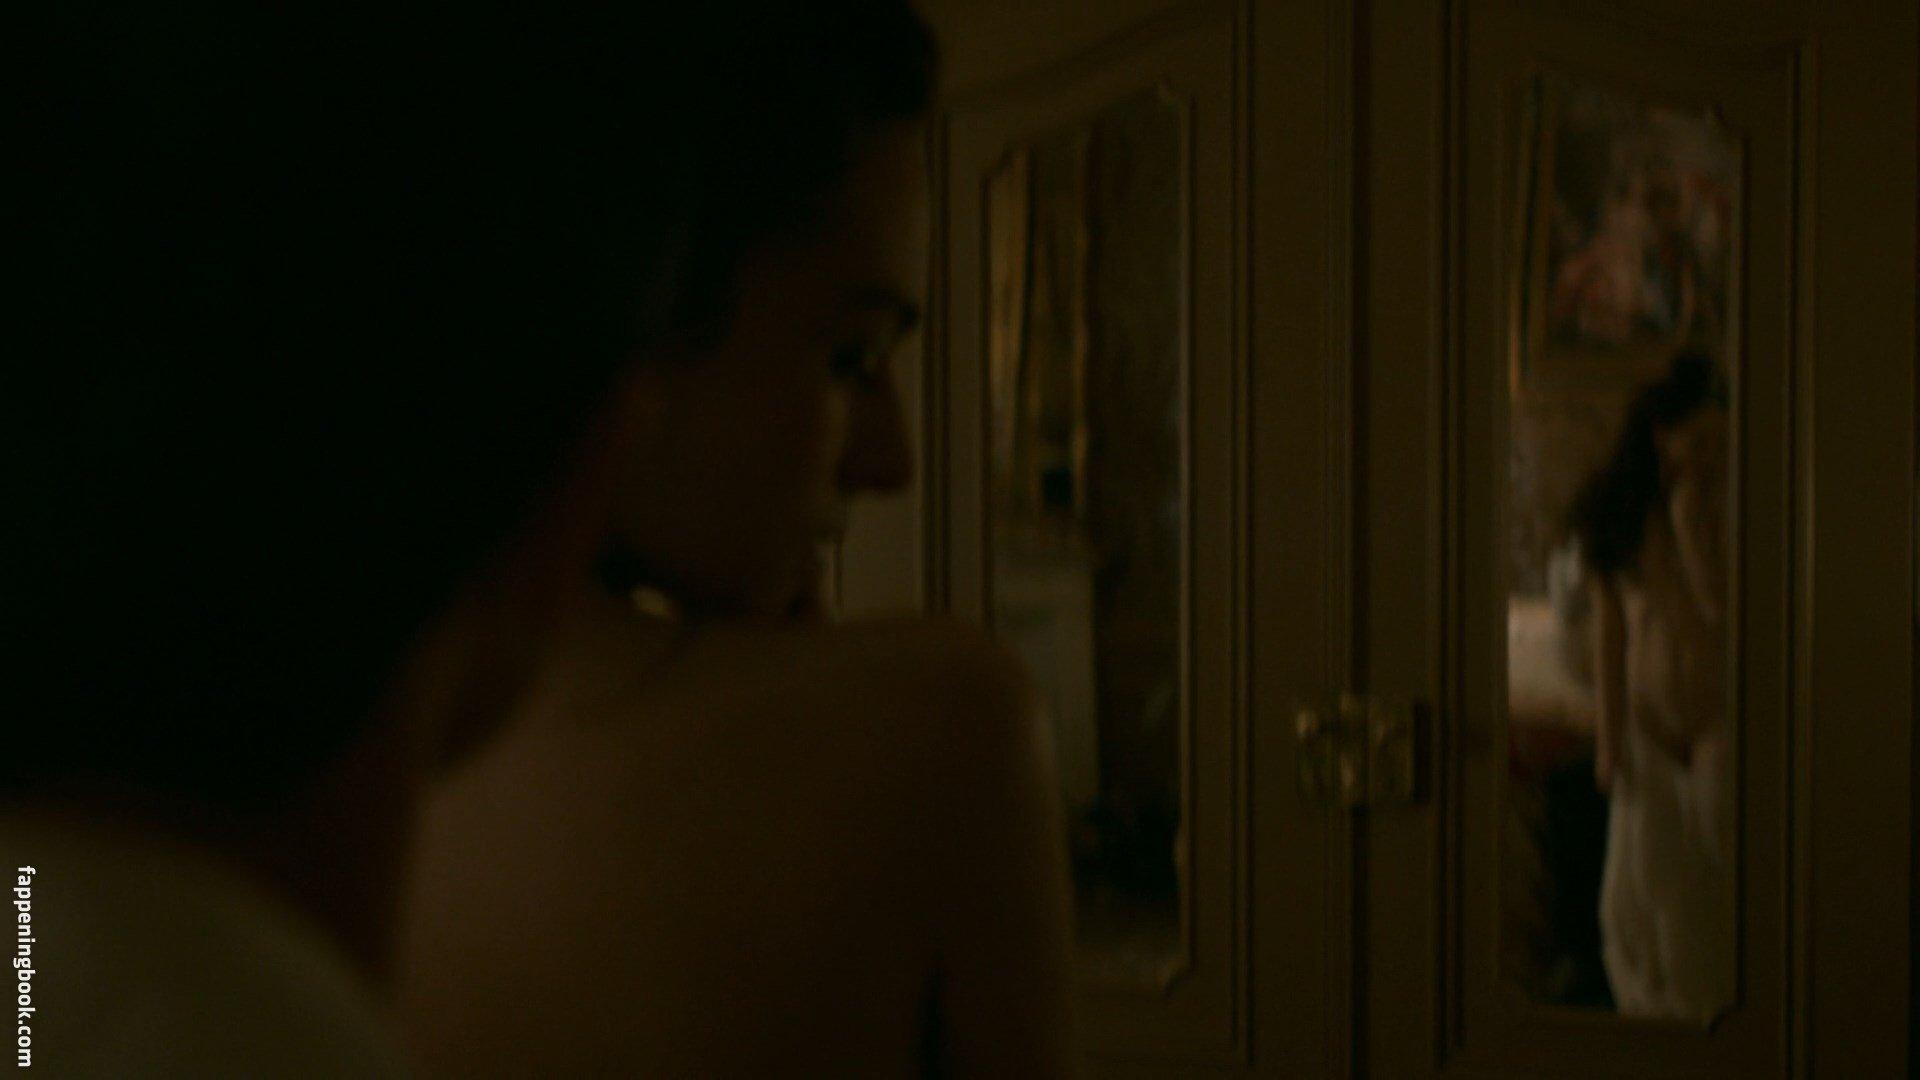 Nackt  Emanuela Postacchini Harvey Weinstein: